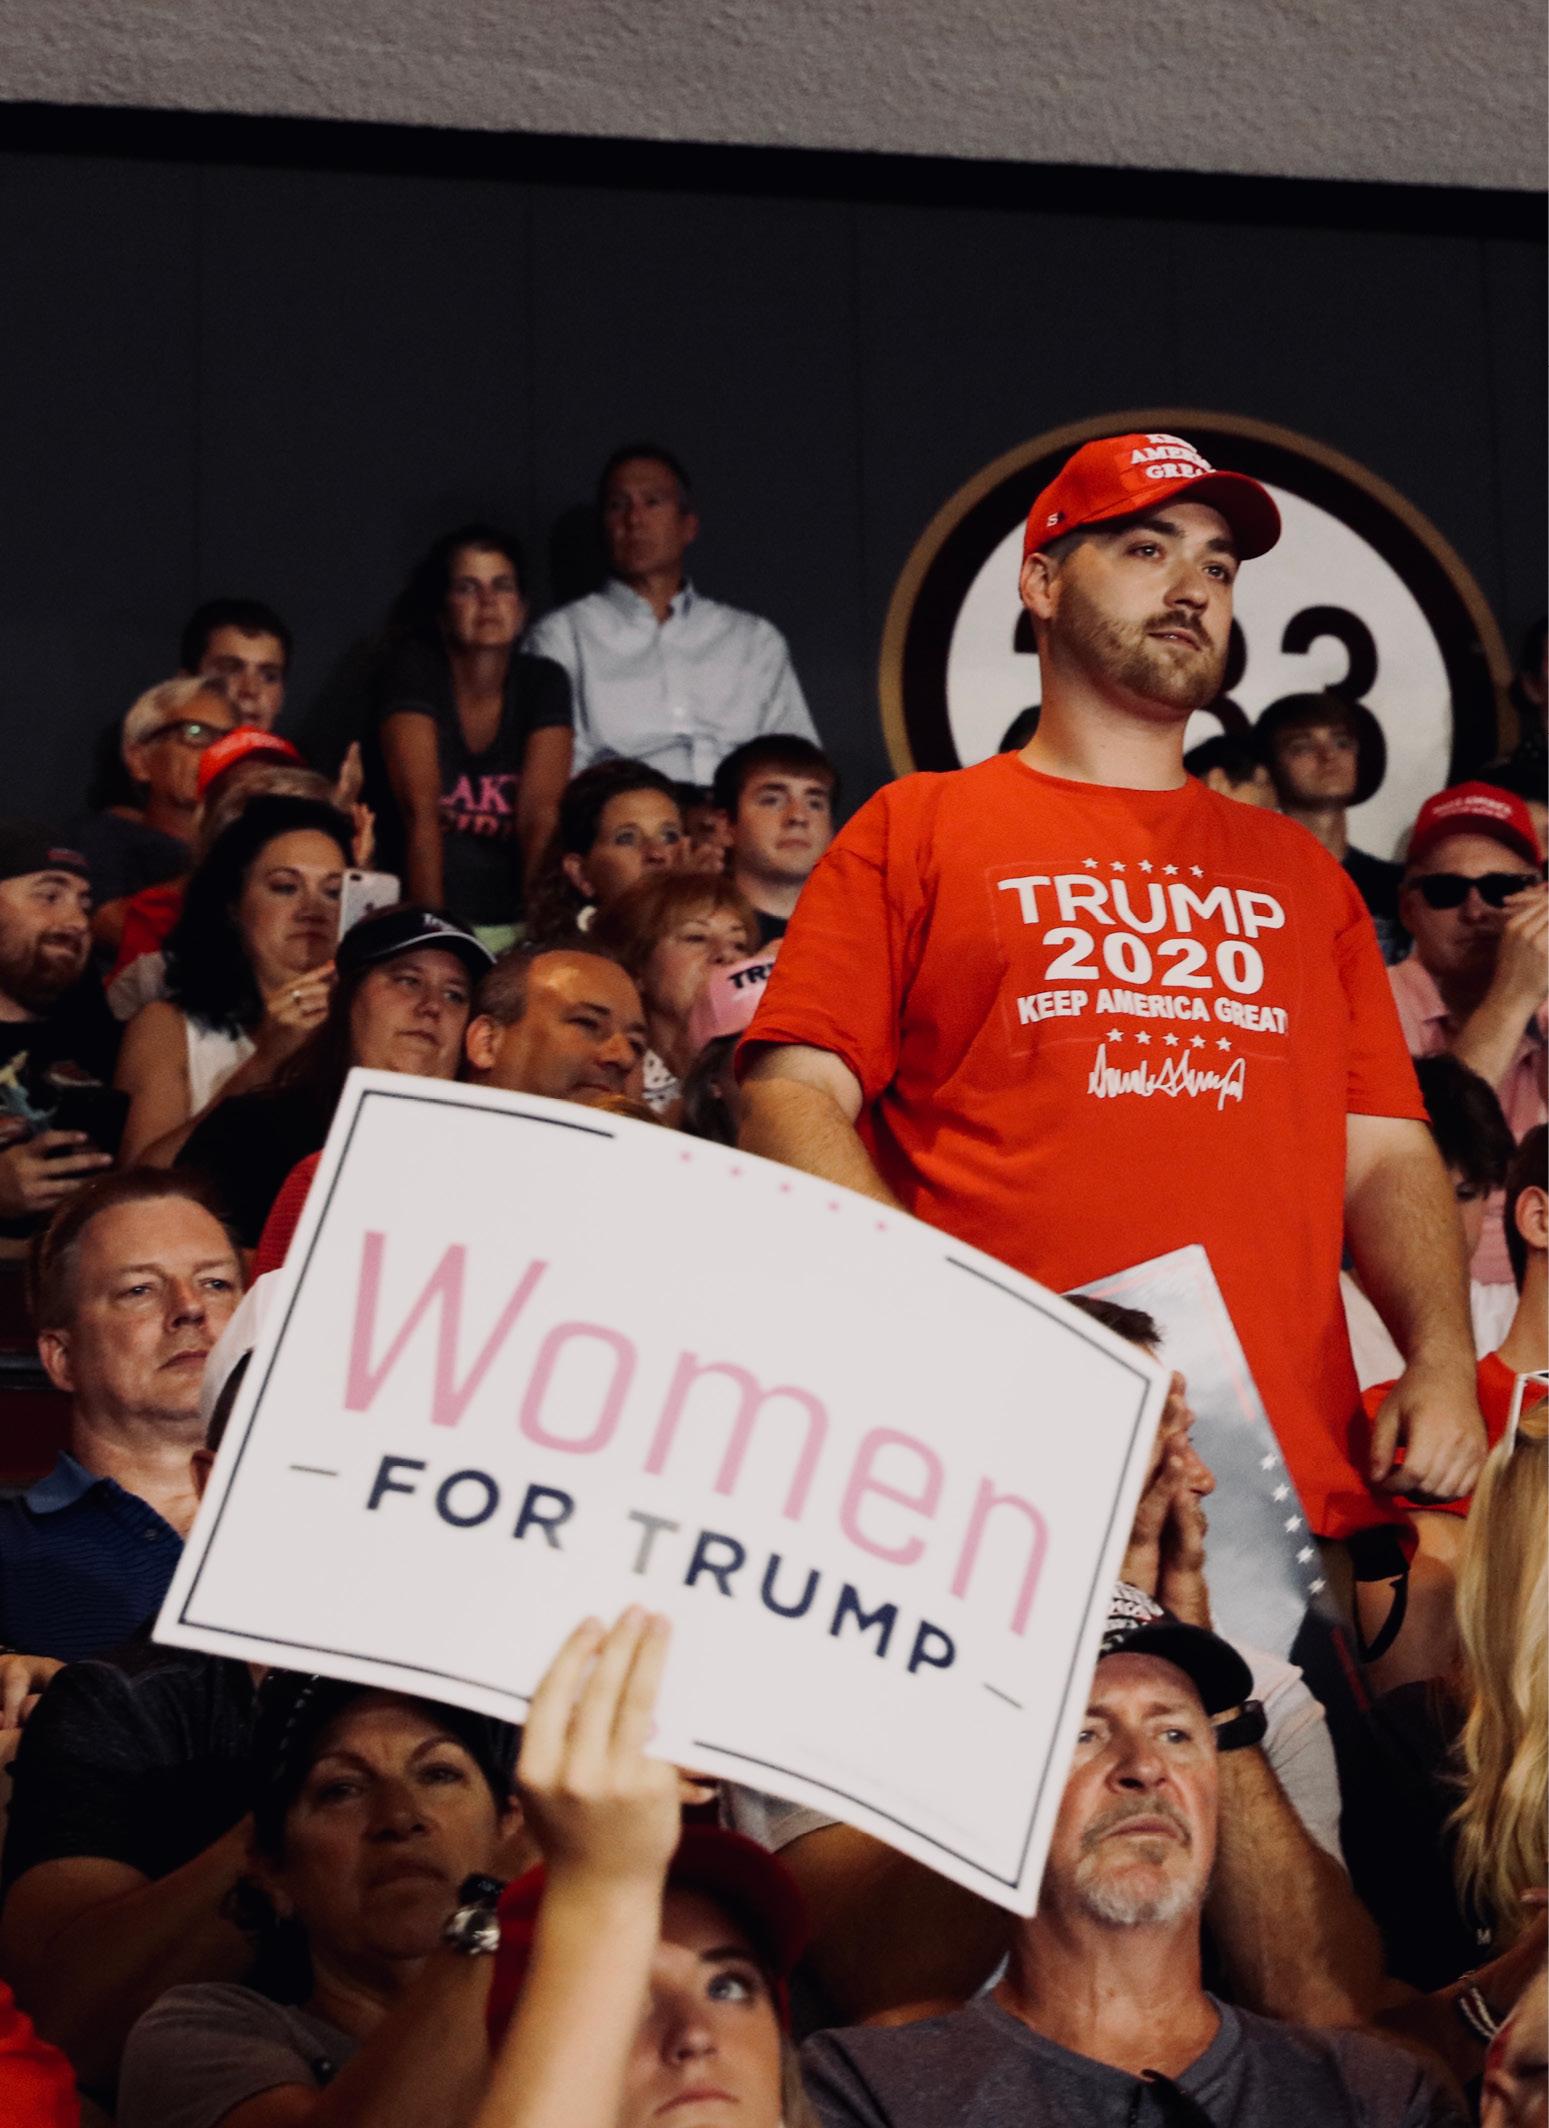 Andy Grant Trump Rally 8.1.19 - II25.jpg